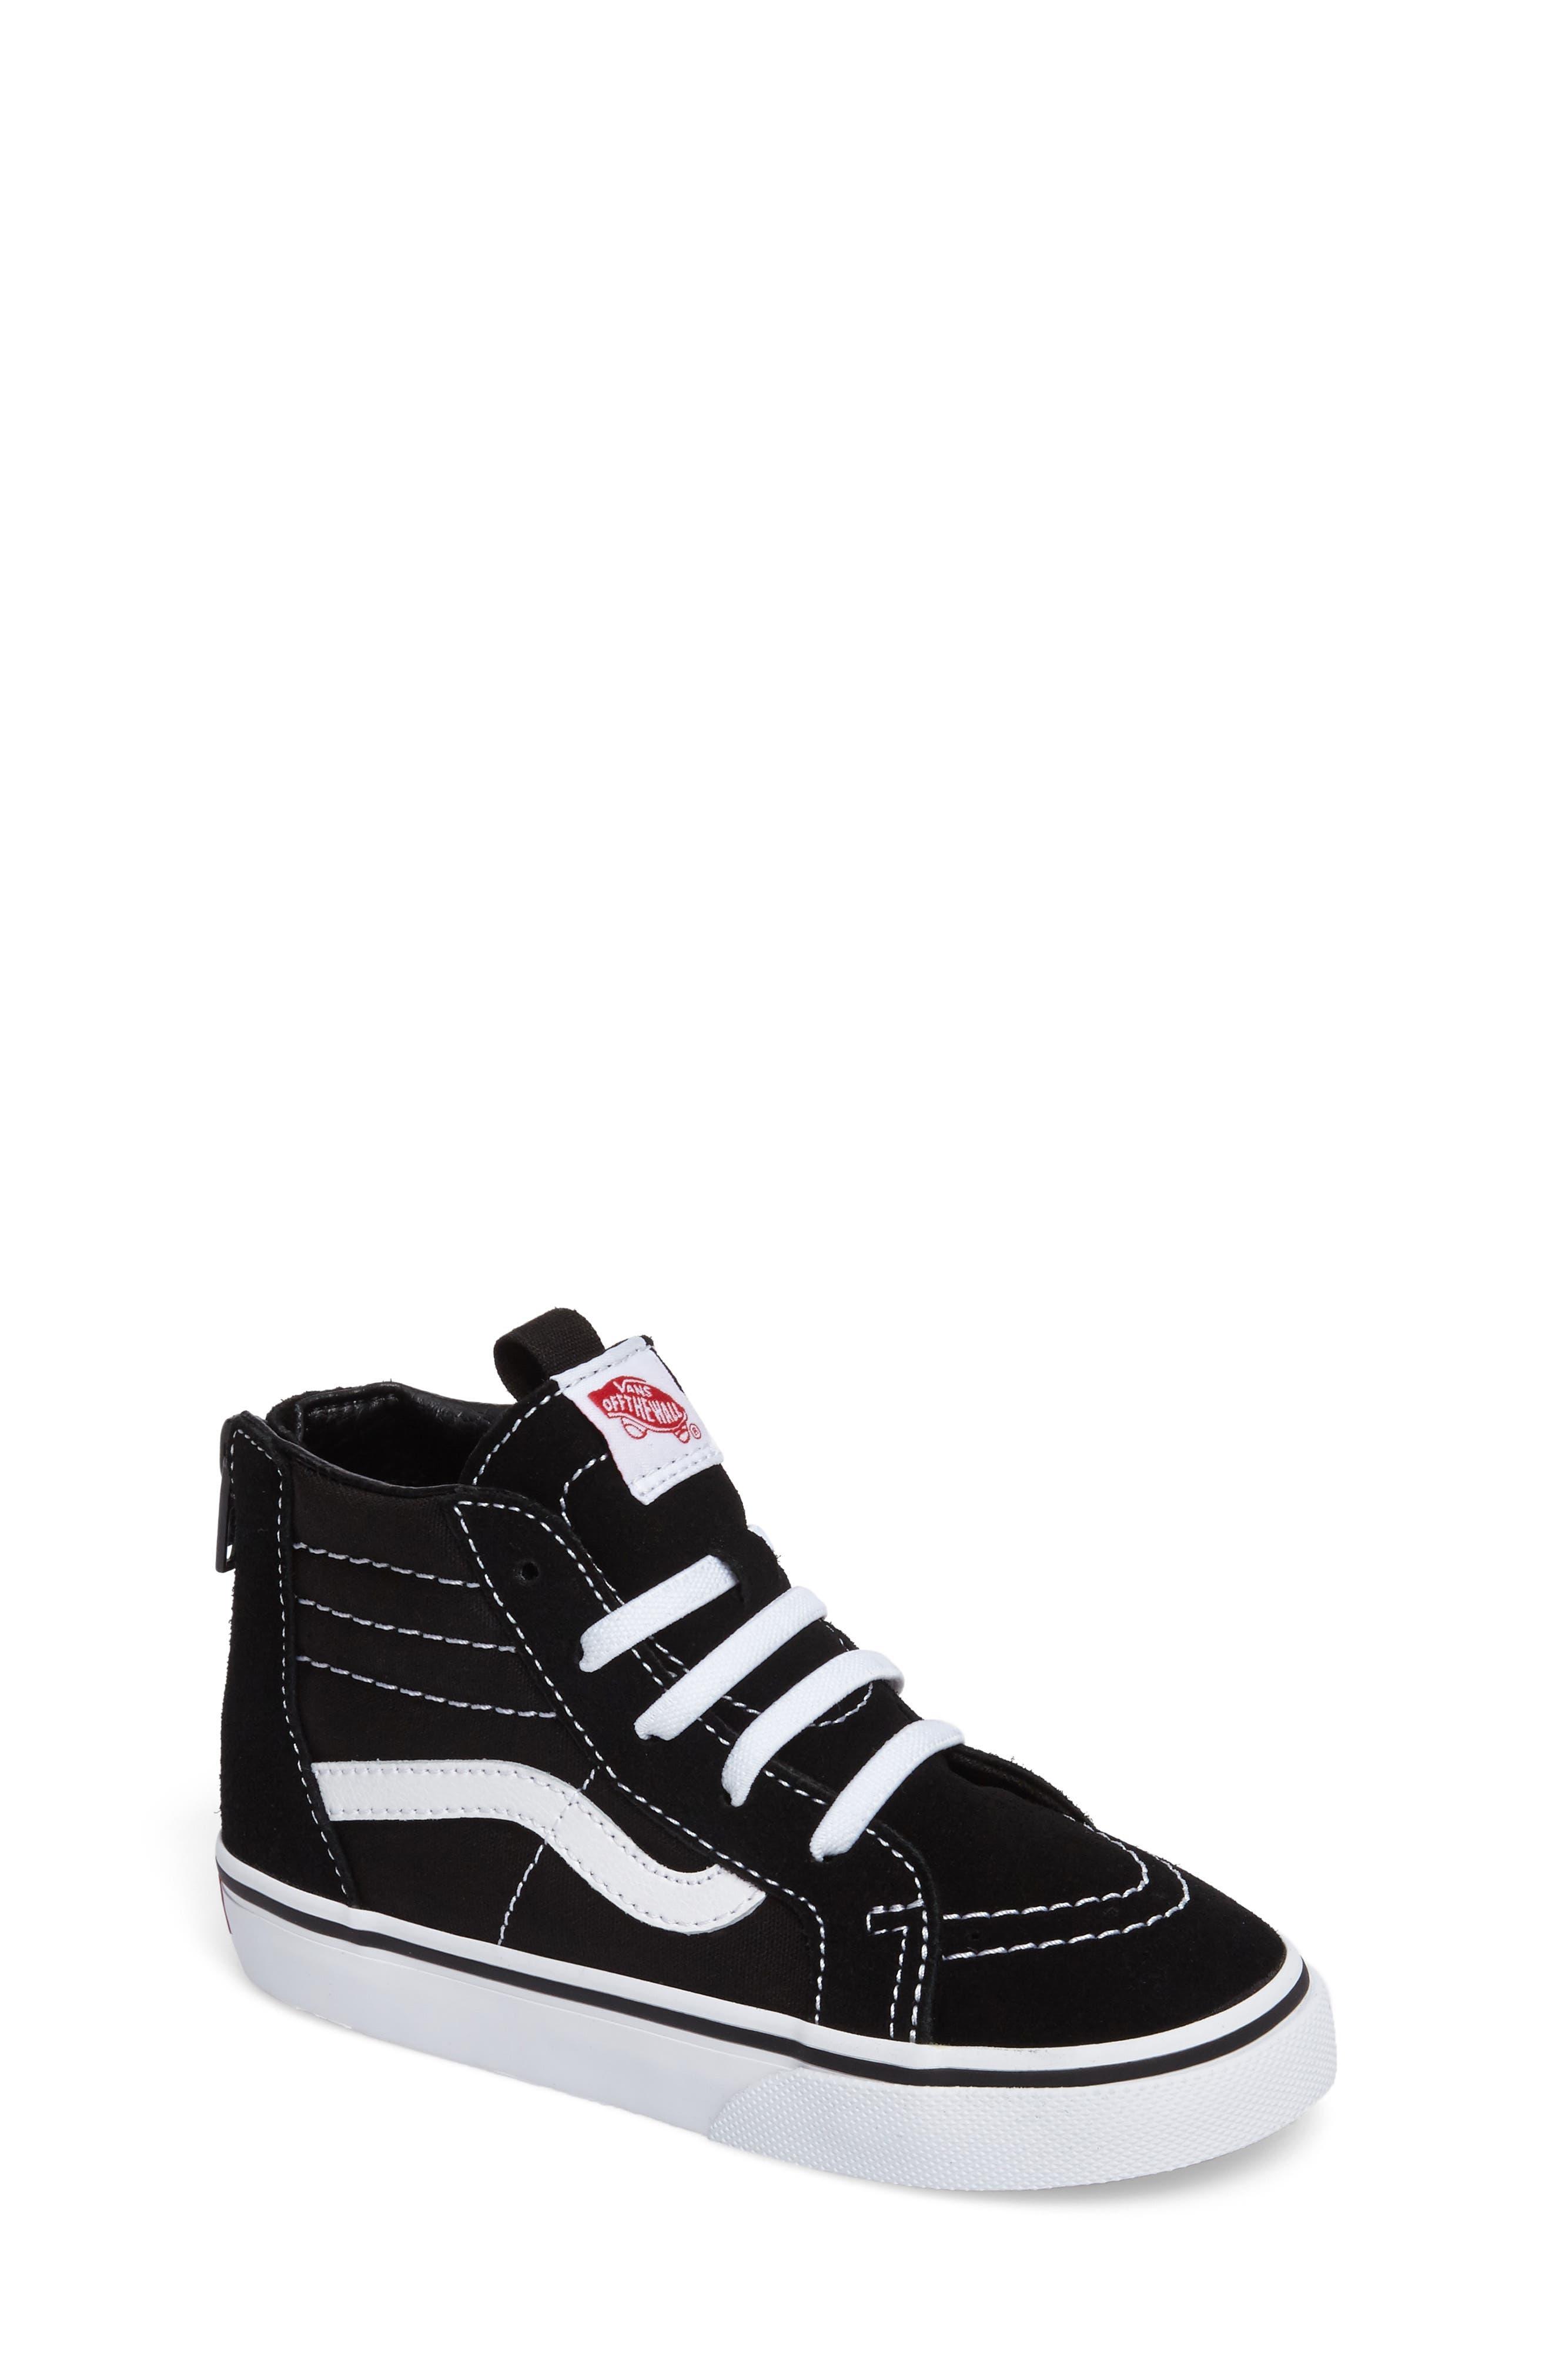 Toddler Boys Vans Sk8Hi Zip Sneaker Size 9 M  Black